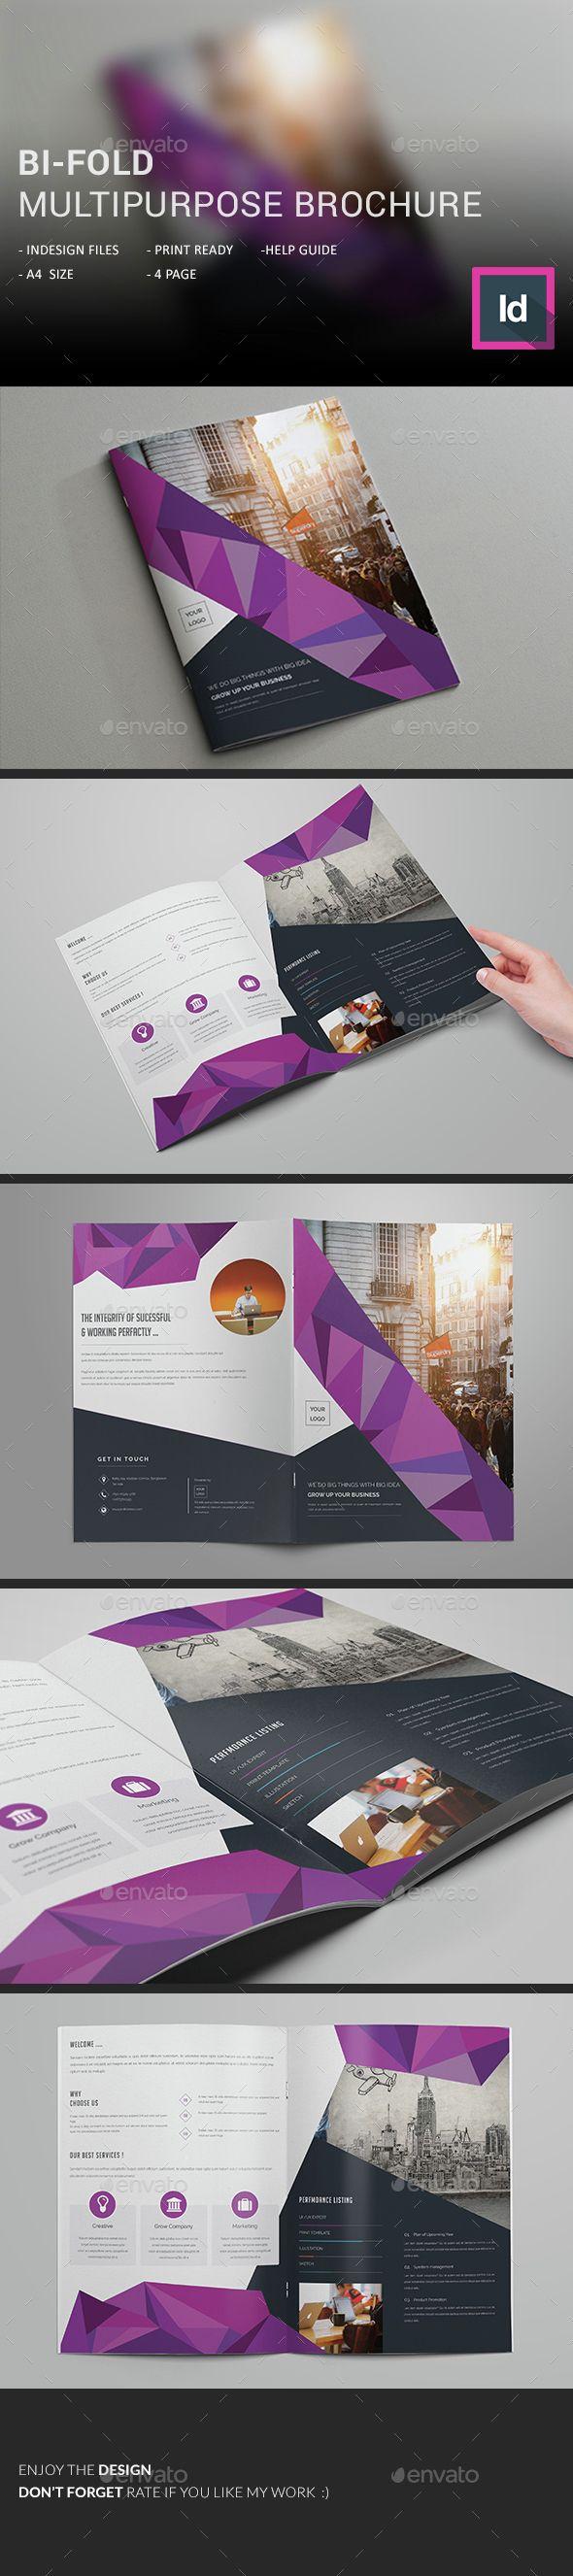 Bi-Fold Multipurpose Brochure Template InDesign INDD. Download here: http://graphicriver.net/item/bifold-multipurpose-brochure/15284043?ref=ksioks